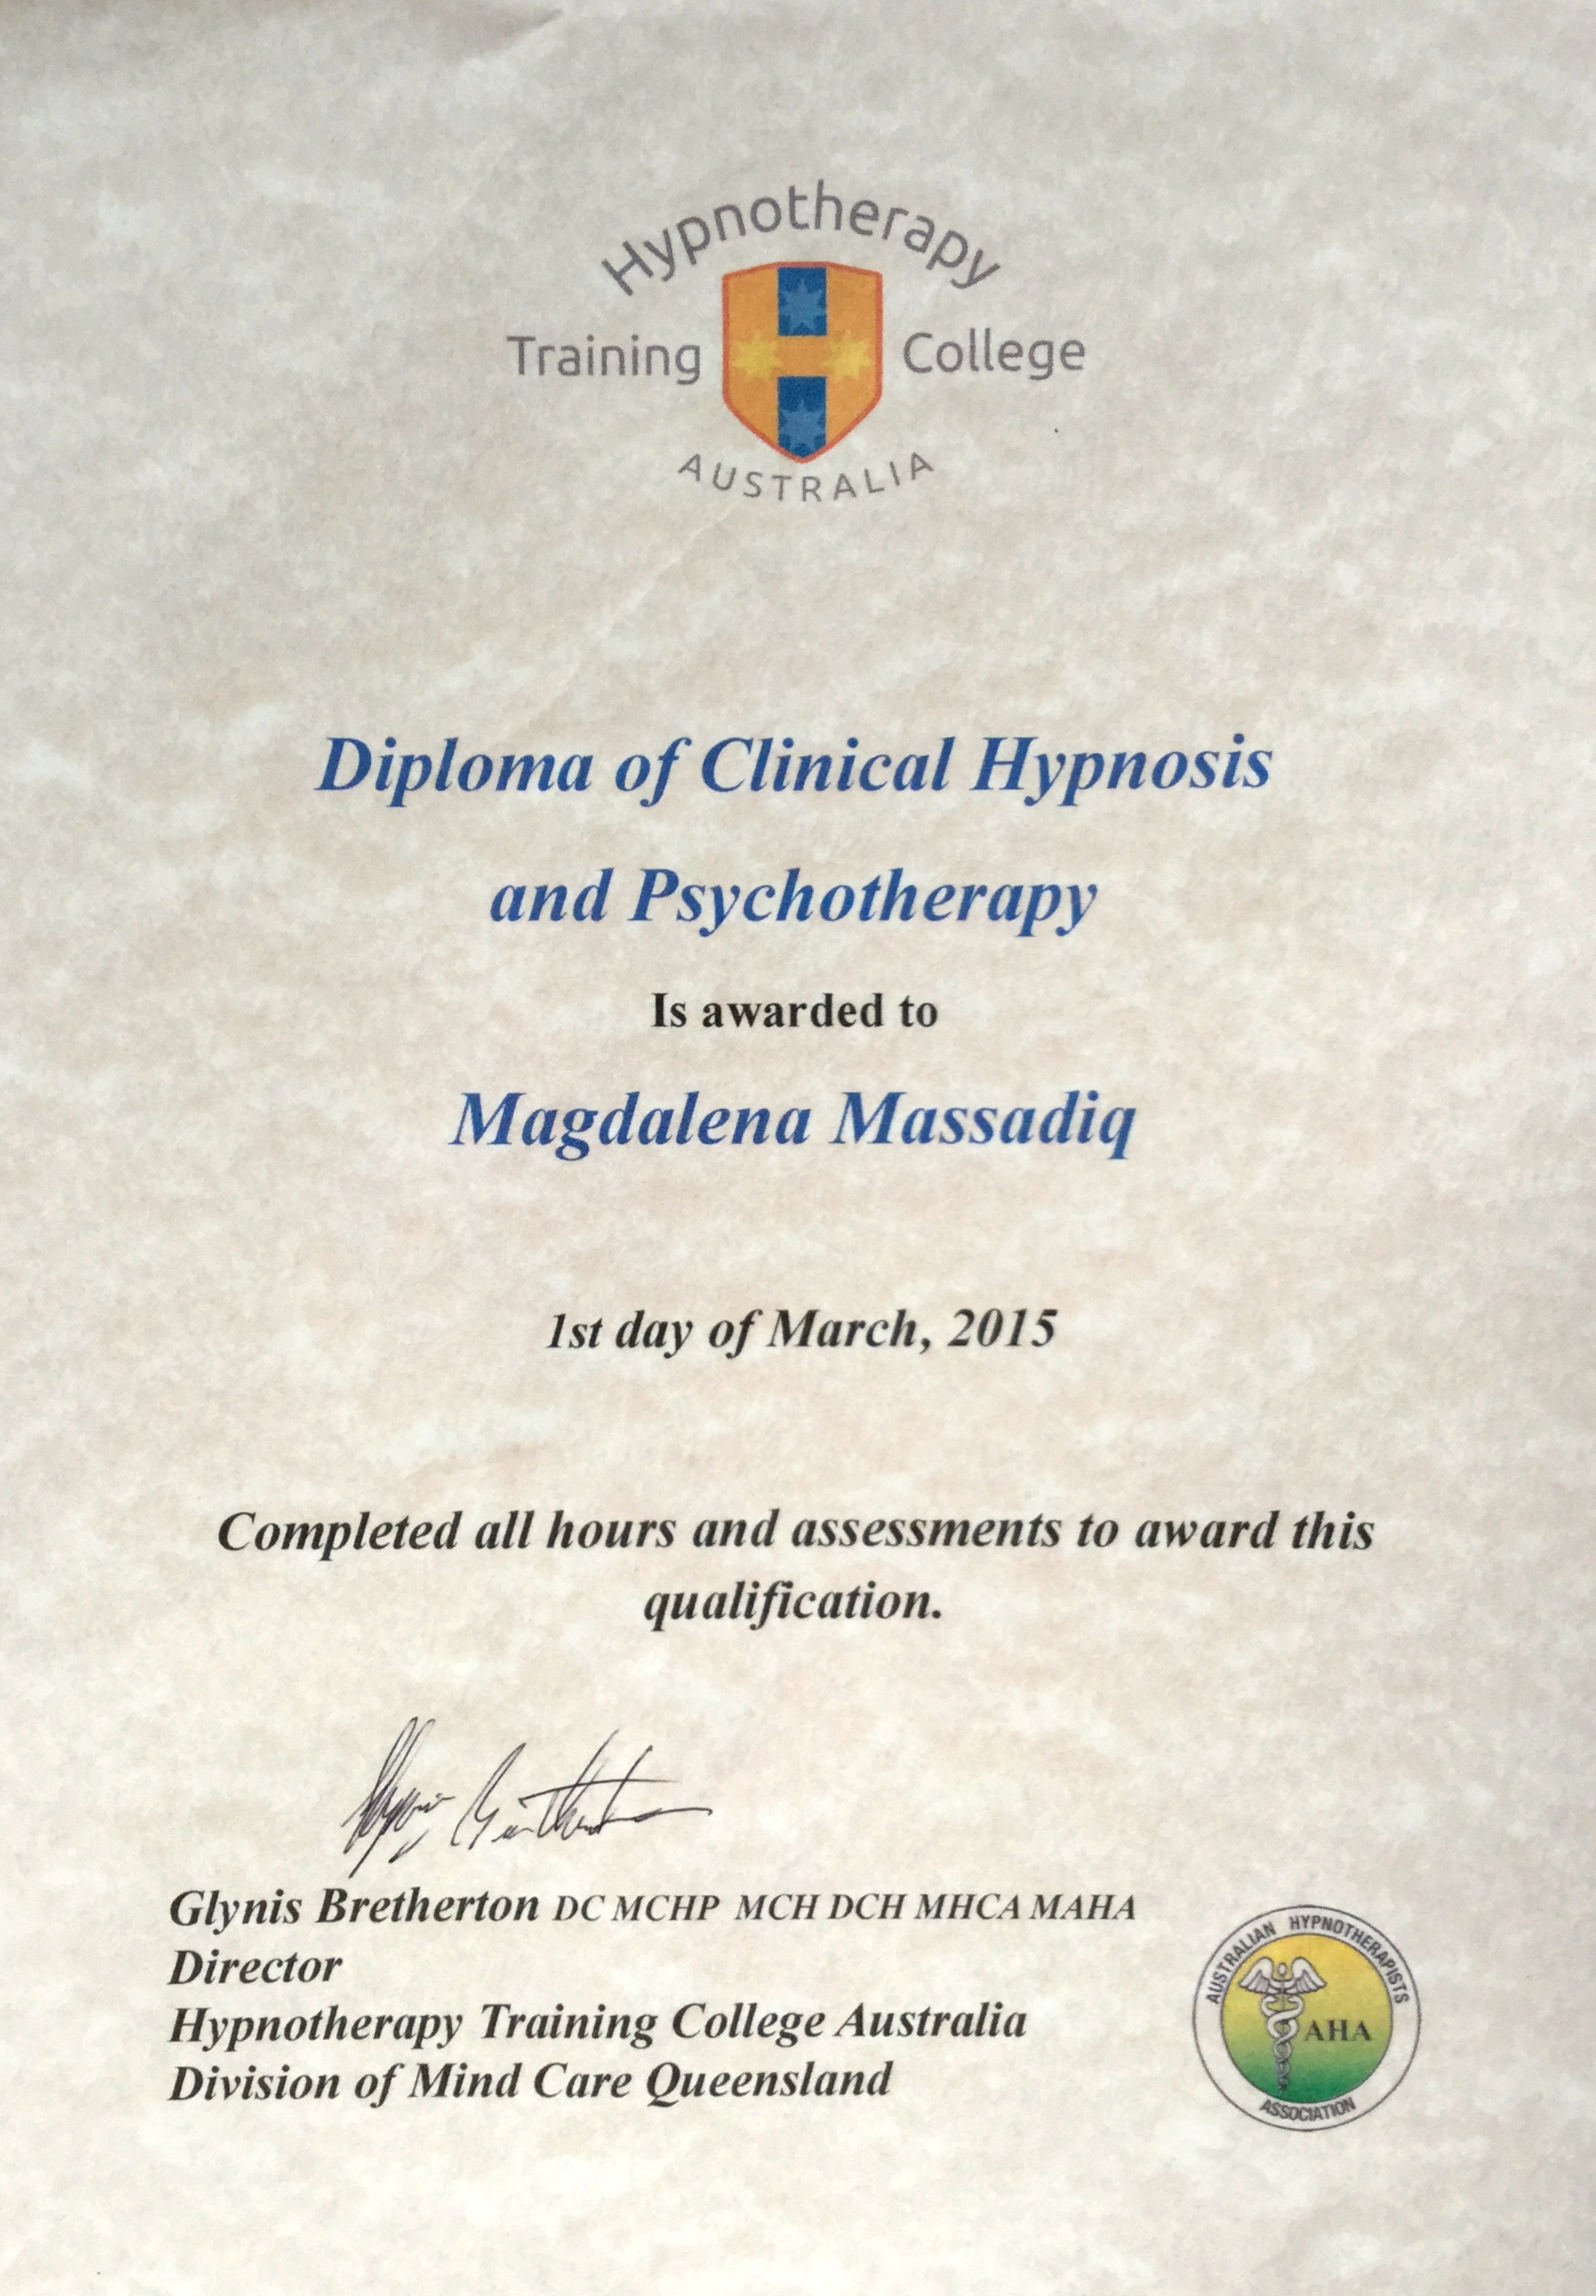 hypno diploma 2.jpg